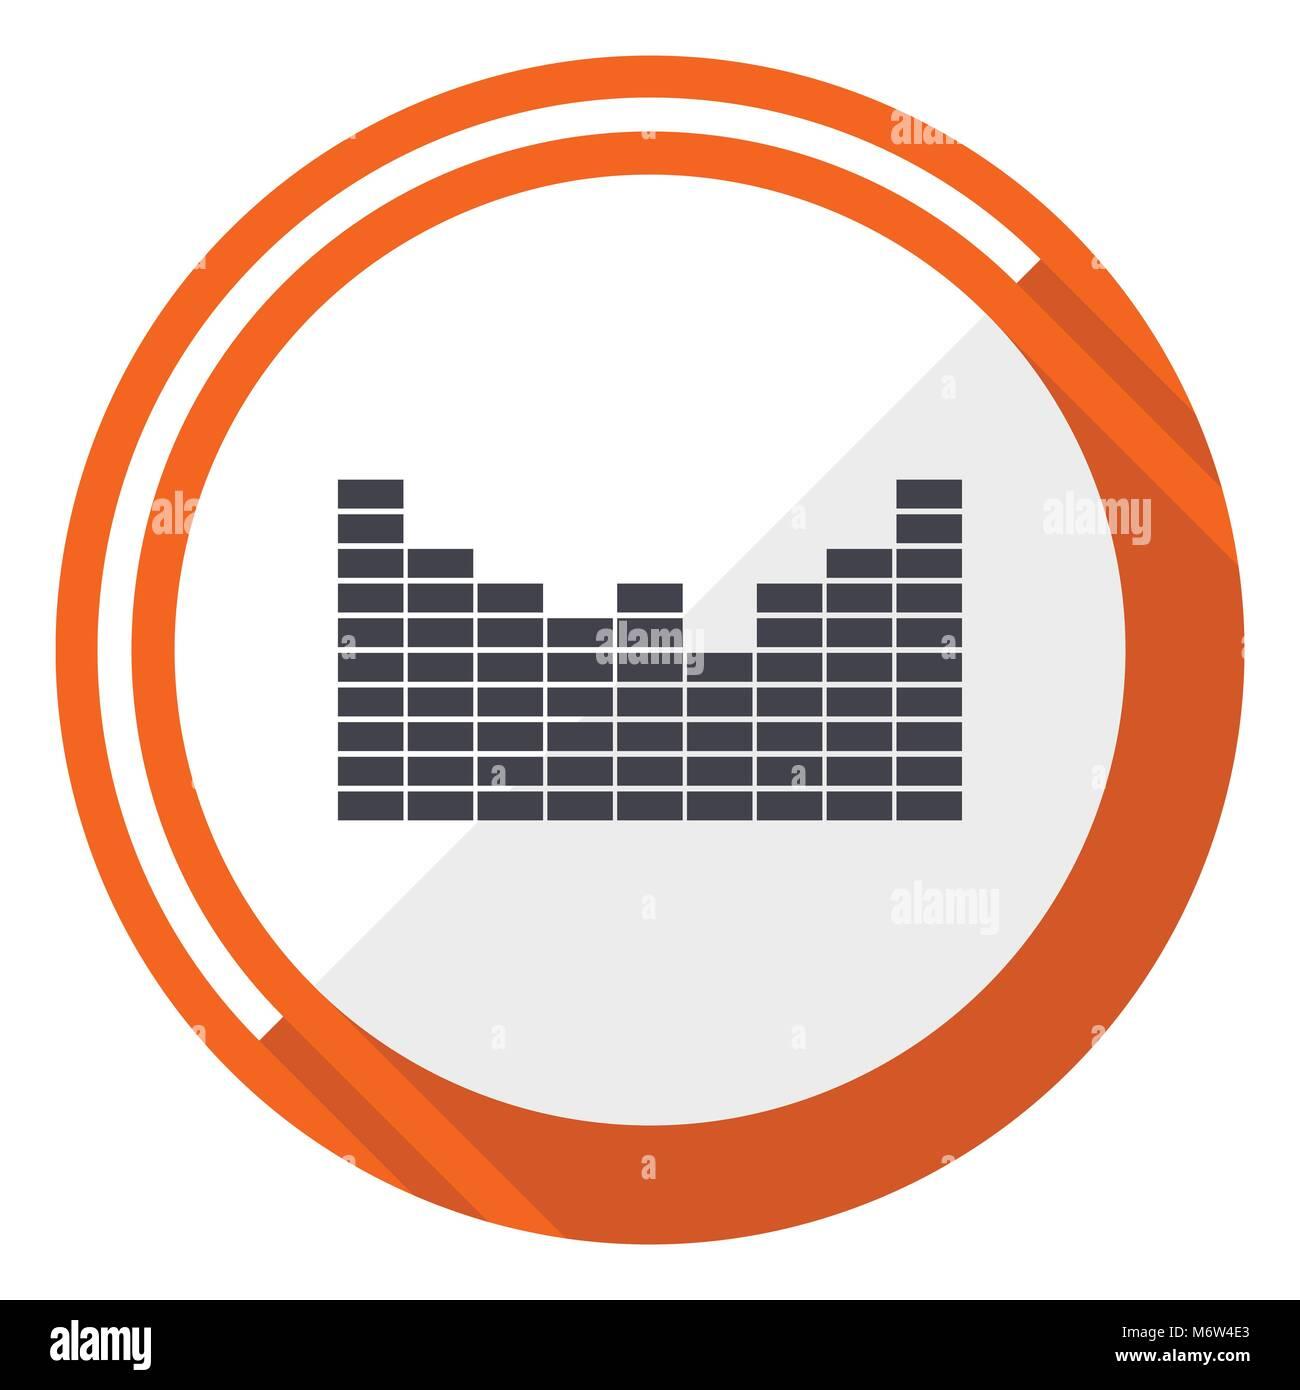 Sound vector icon - Stock Image